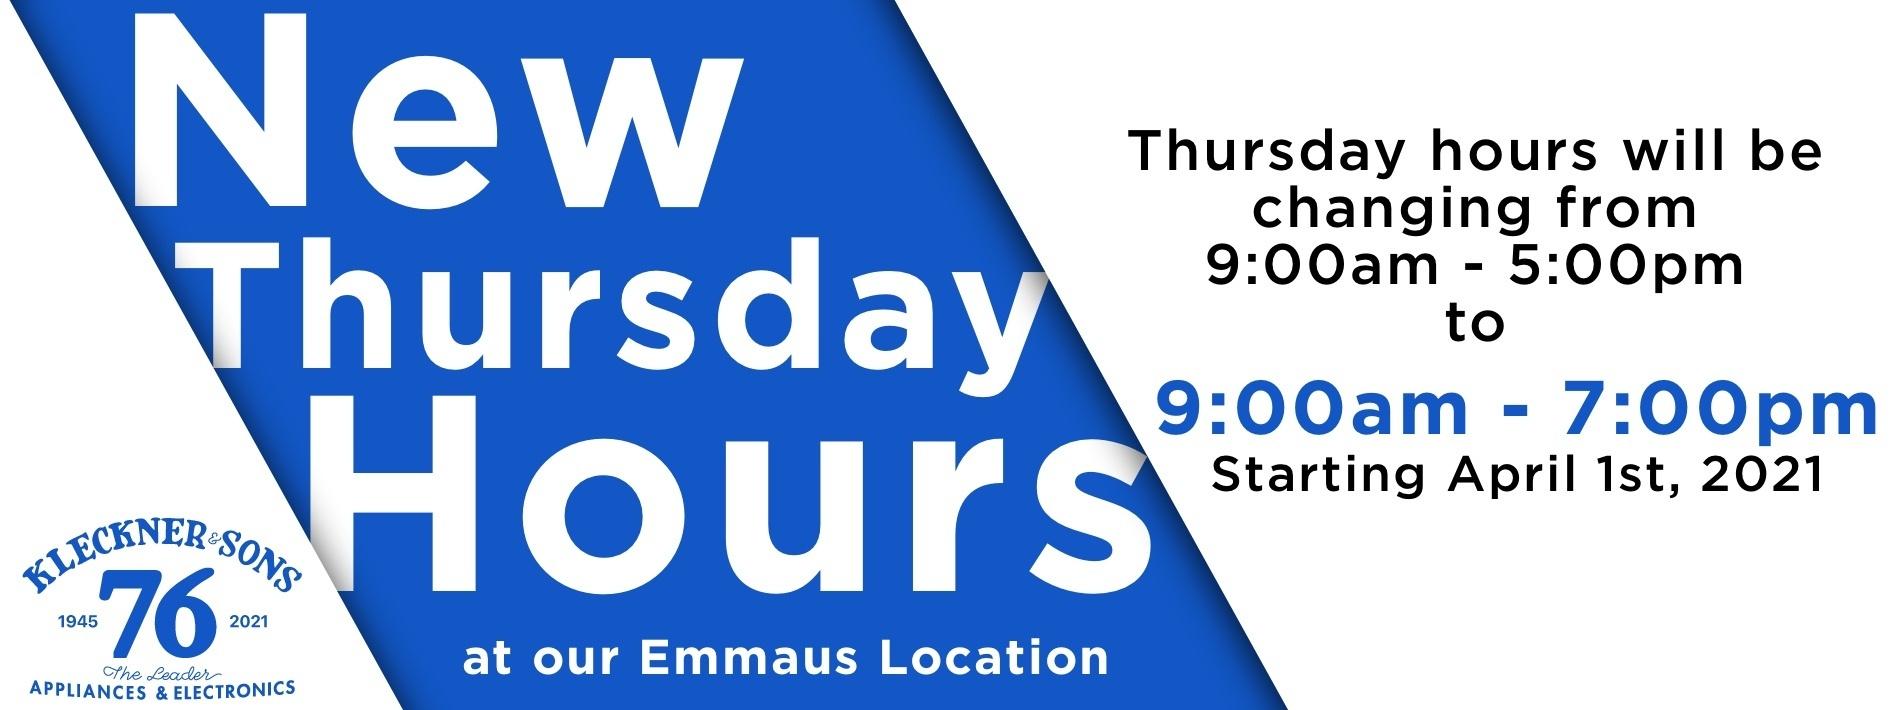 New Hours: Emmaus Location 5